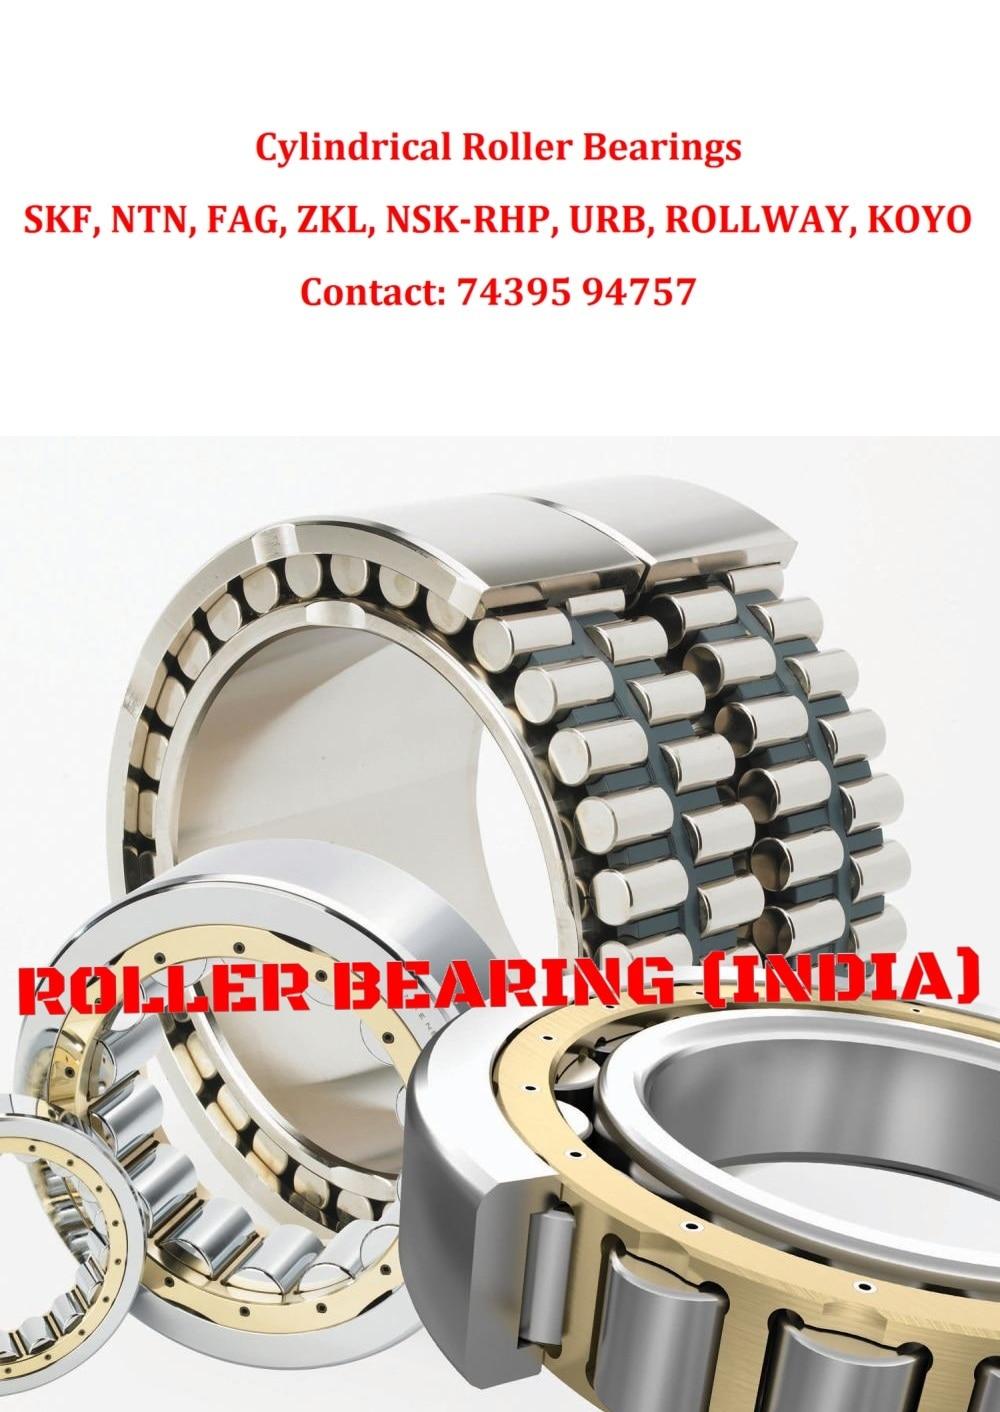 SKF Cylindrical Roller Bearings Bearing no  | SKF - FAG - NTN - NSK